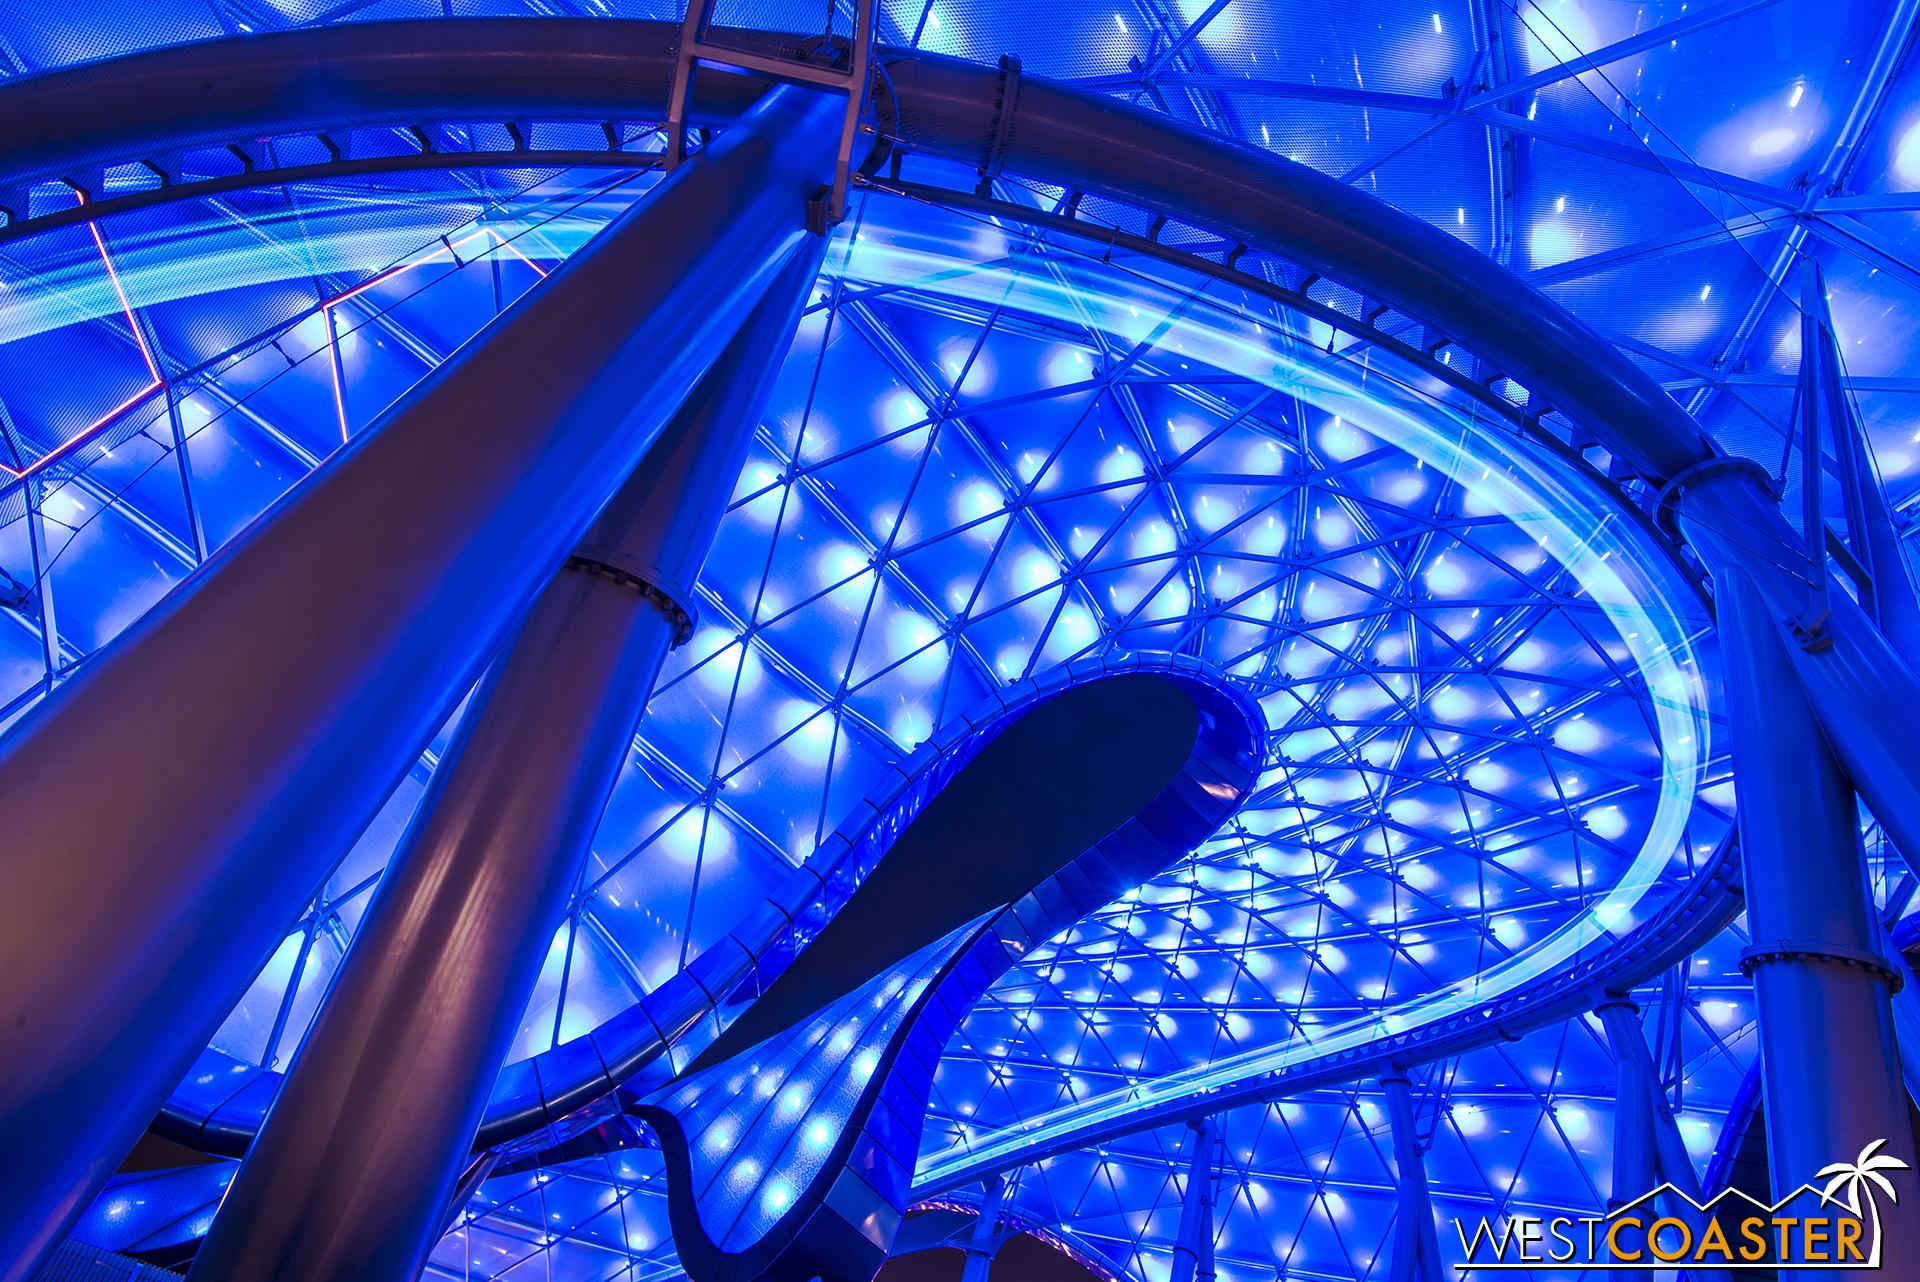 A lightcycle streaks around a turn in Tomorrowland.